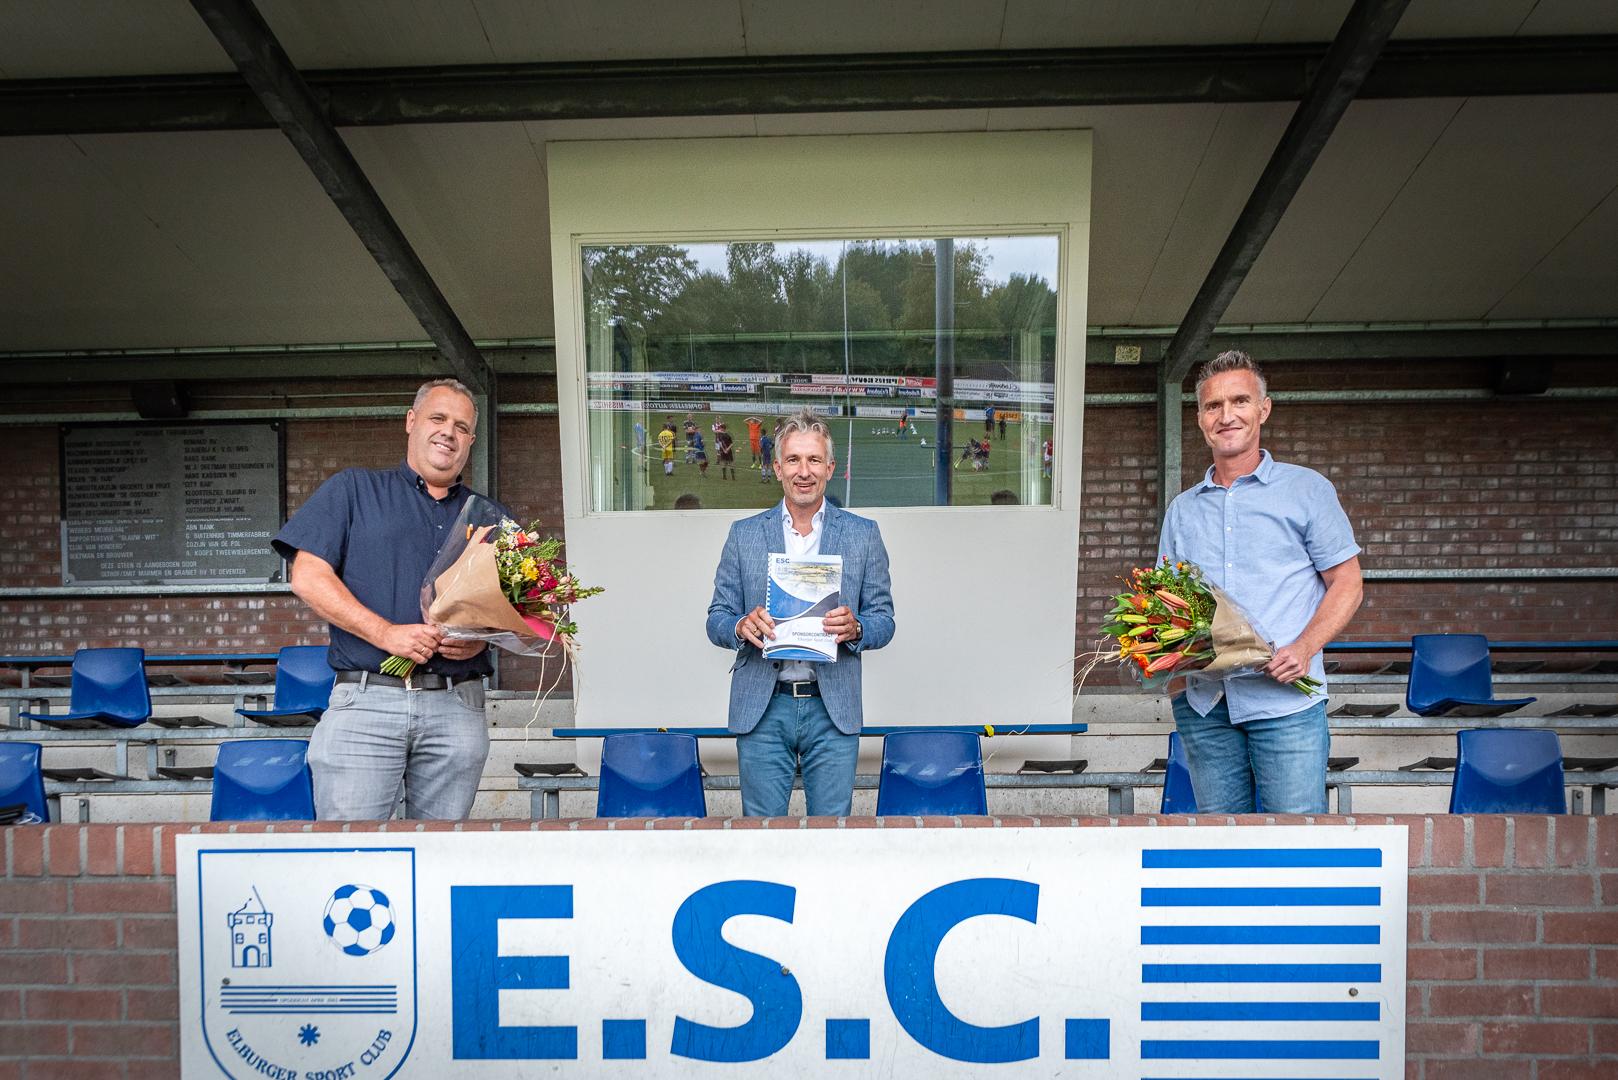 VDH Civiel Projectmanagement en GS Meppel nieuwe kledingsponsoren ESC 8 - Elburger SC